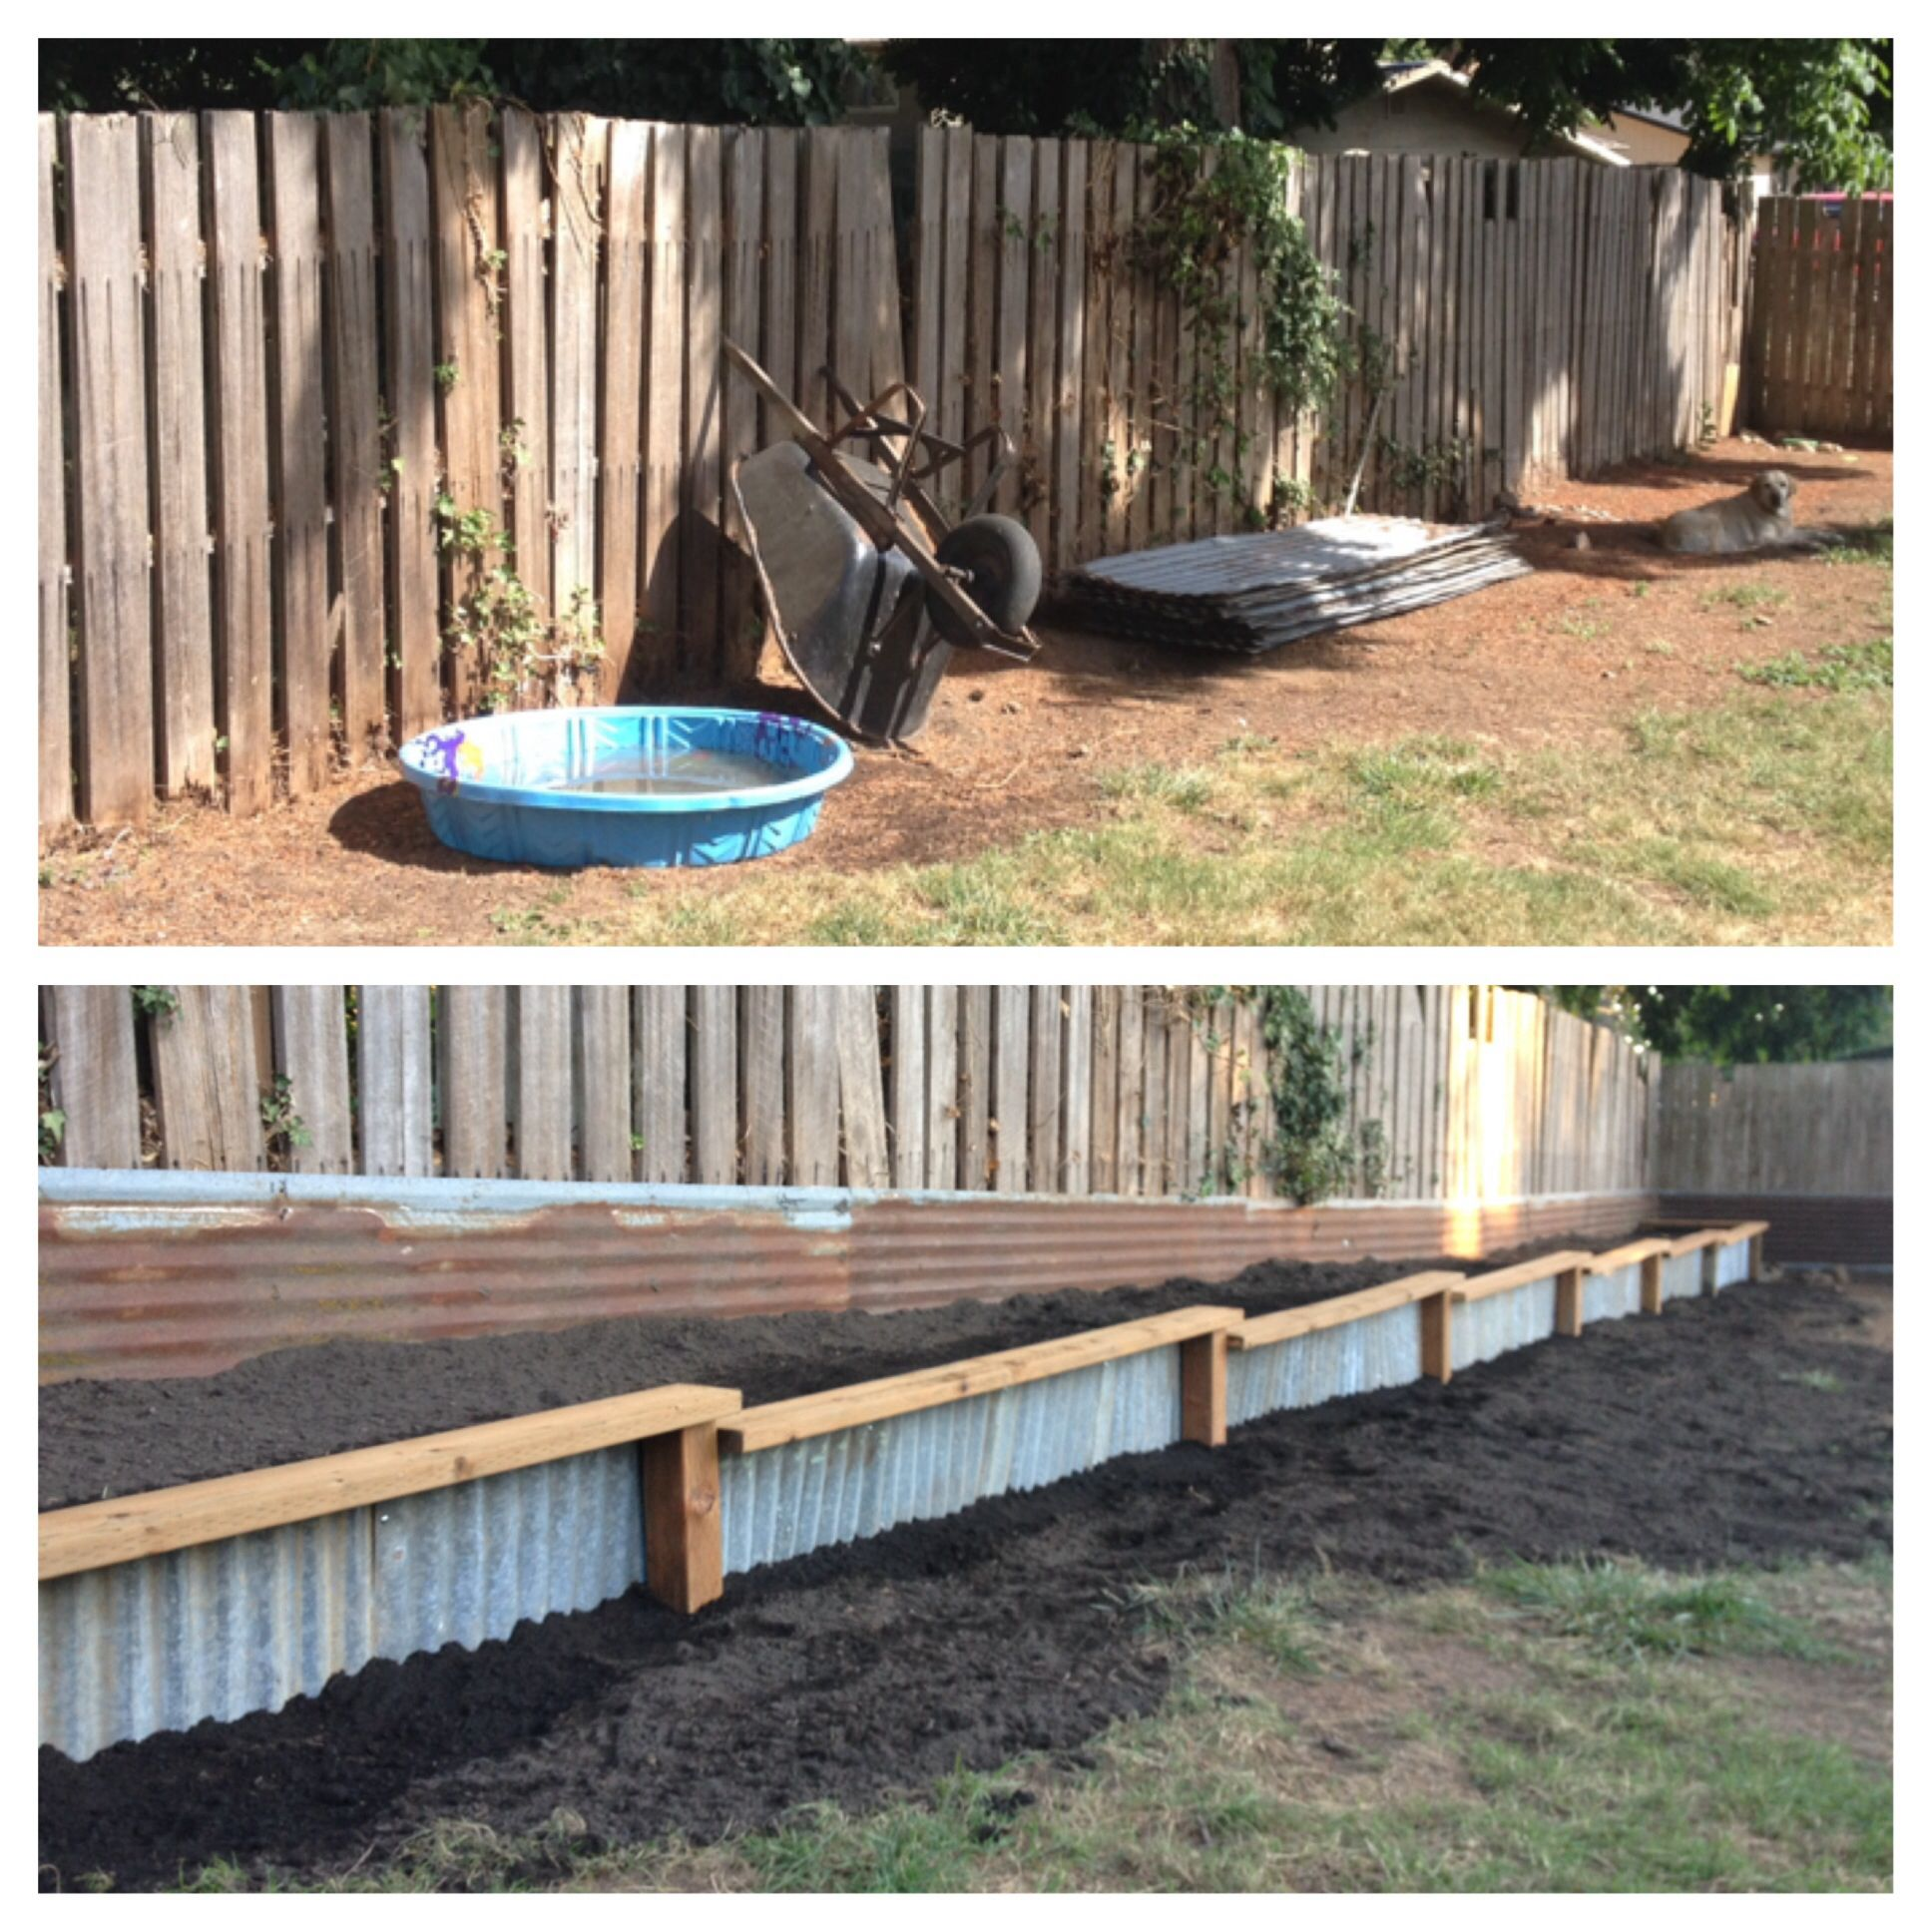 Landscaping Border Before After Reclaimed Corrugated Metal Metal Garden Edging Garden Edging Landscape Borders